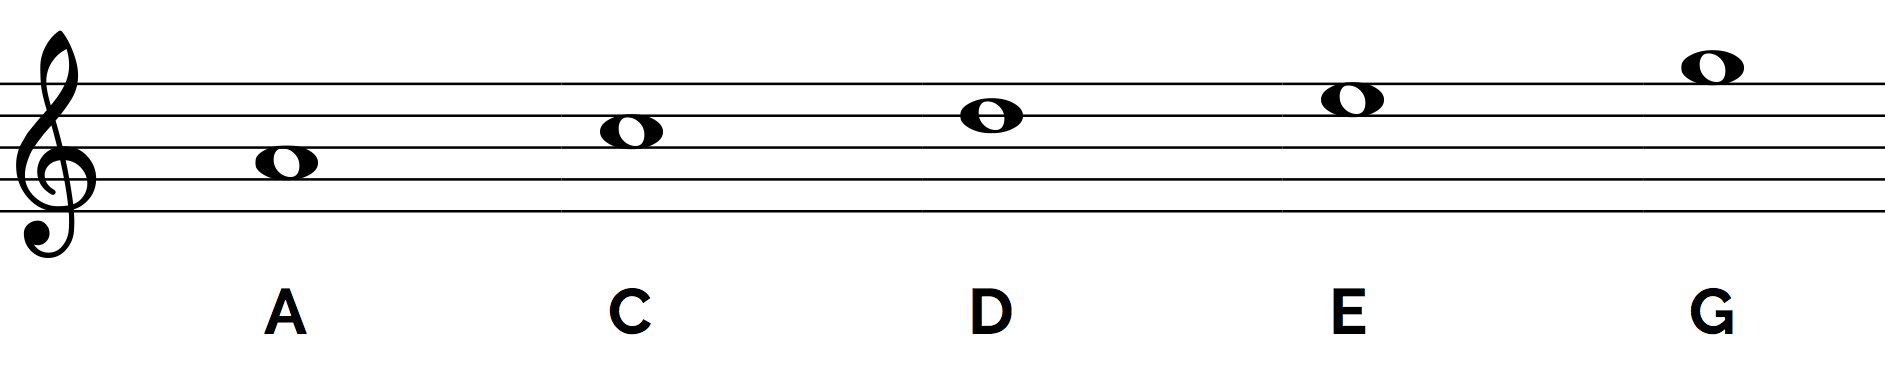 pentatonic-a-minor